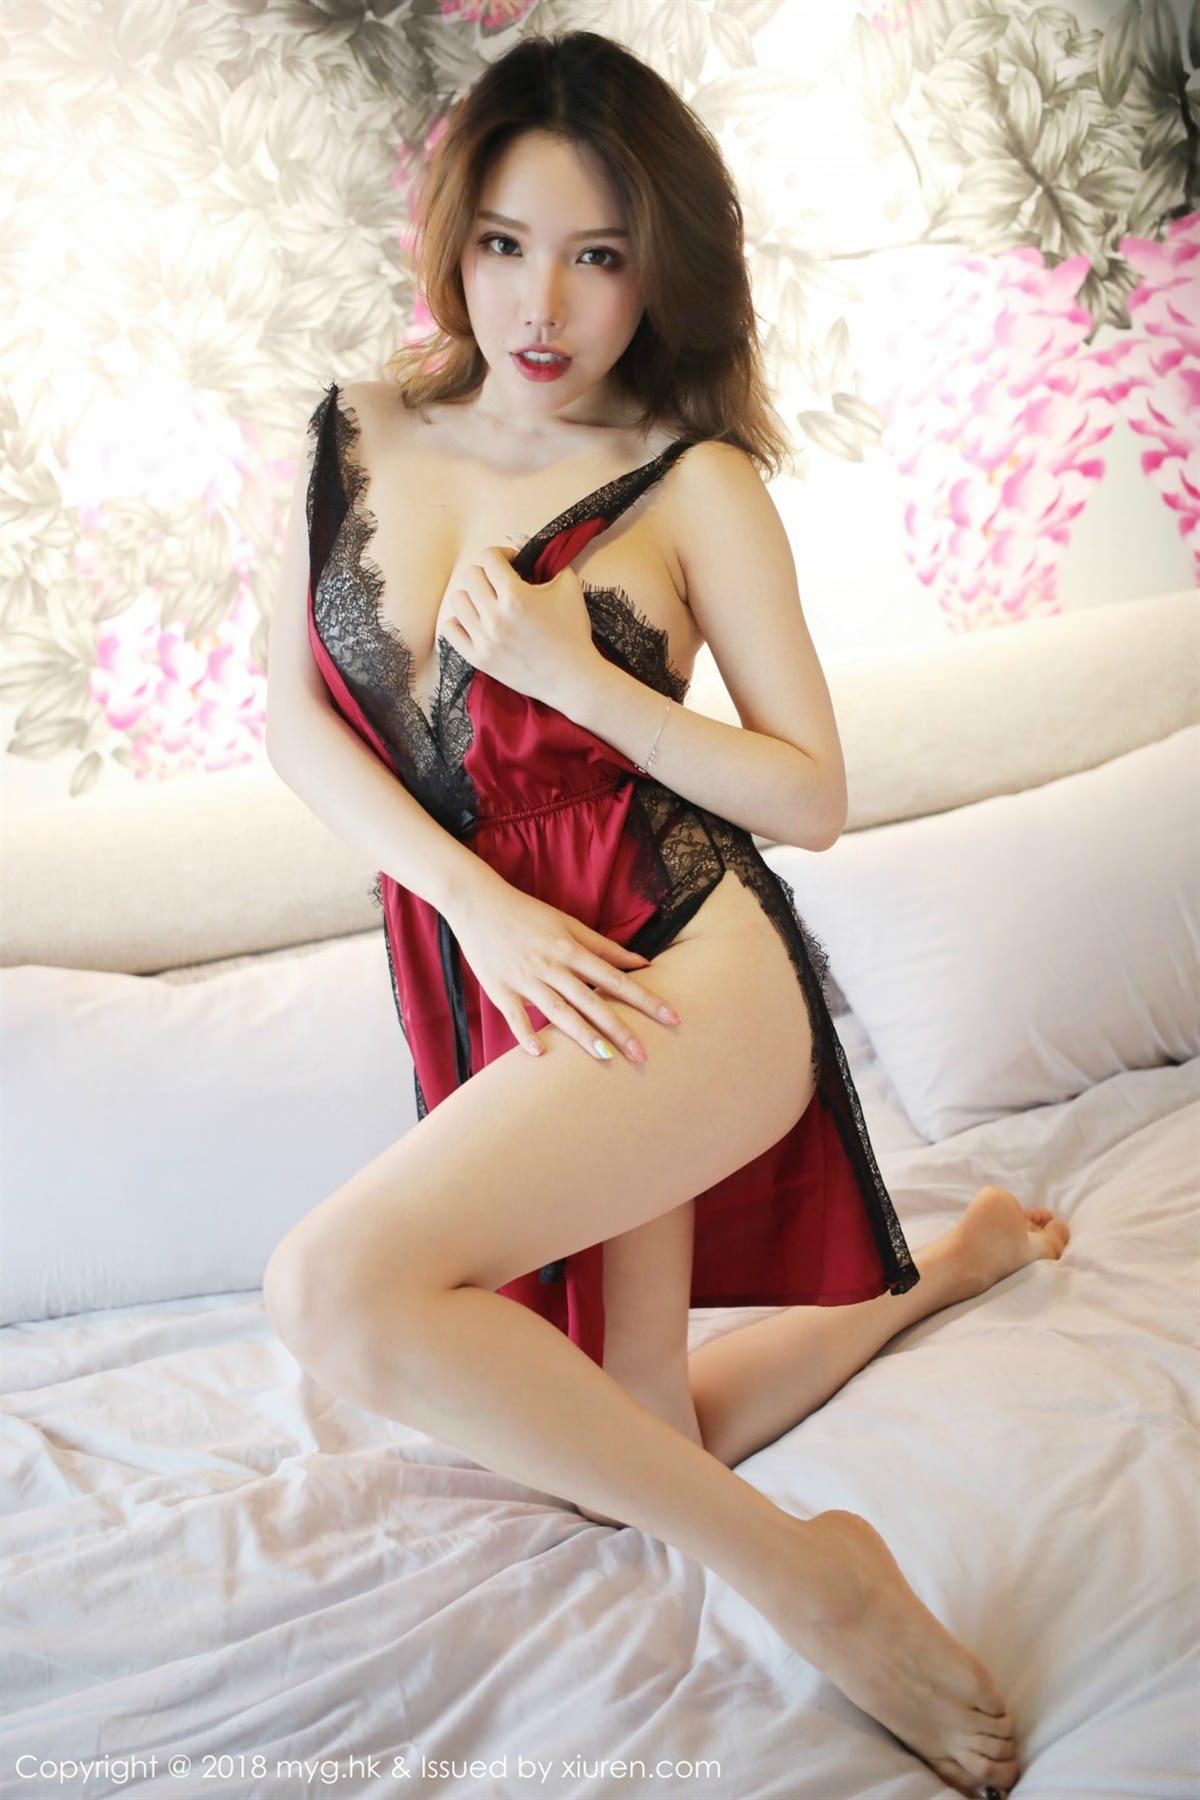 MyGirl Vol.292 6P, Huang Le Ran, mygirl